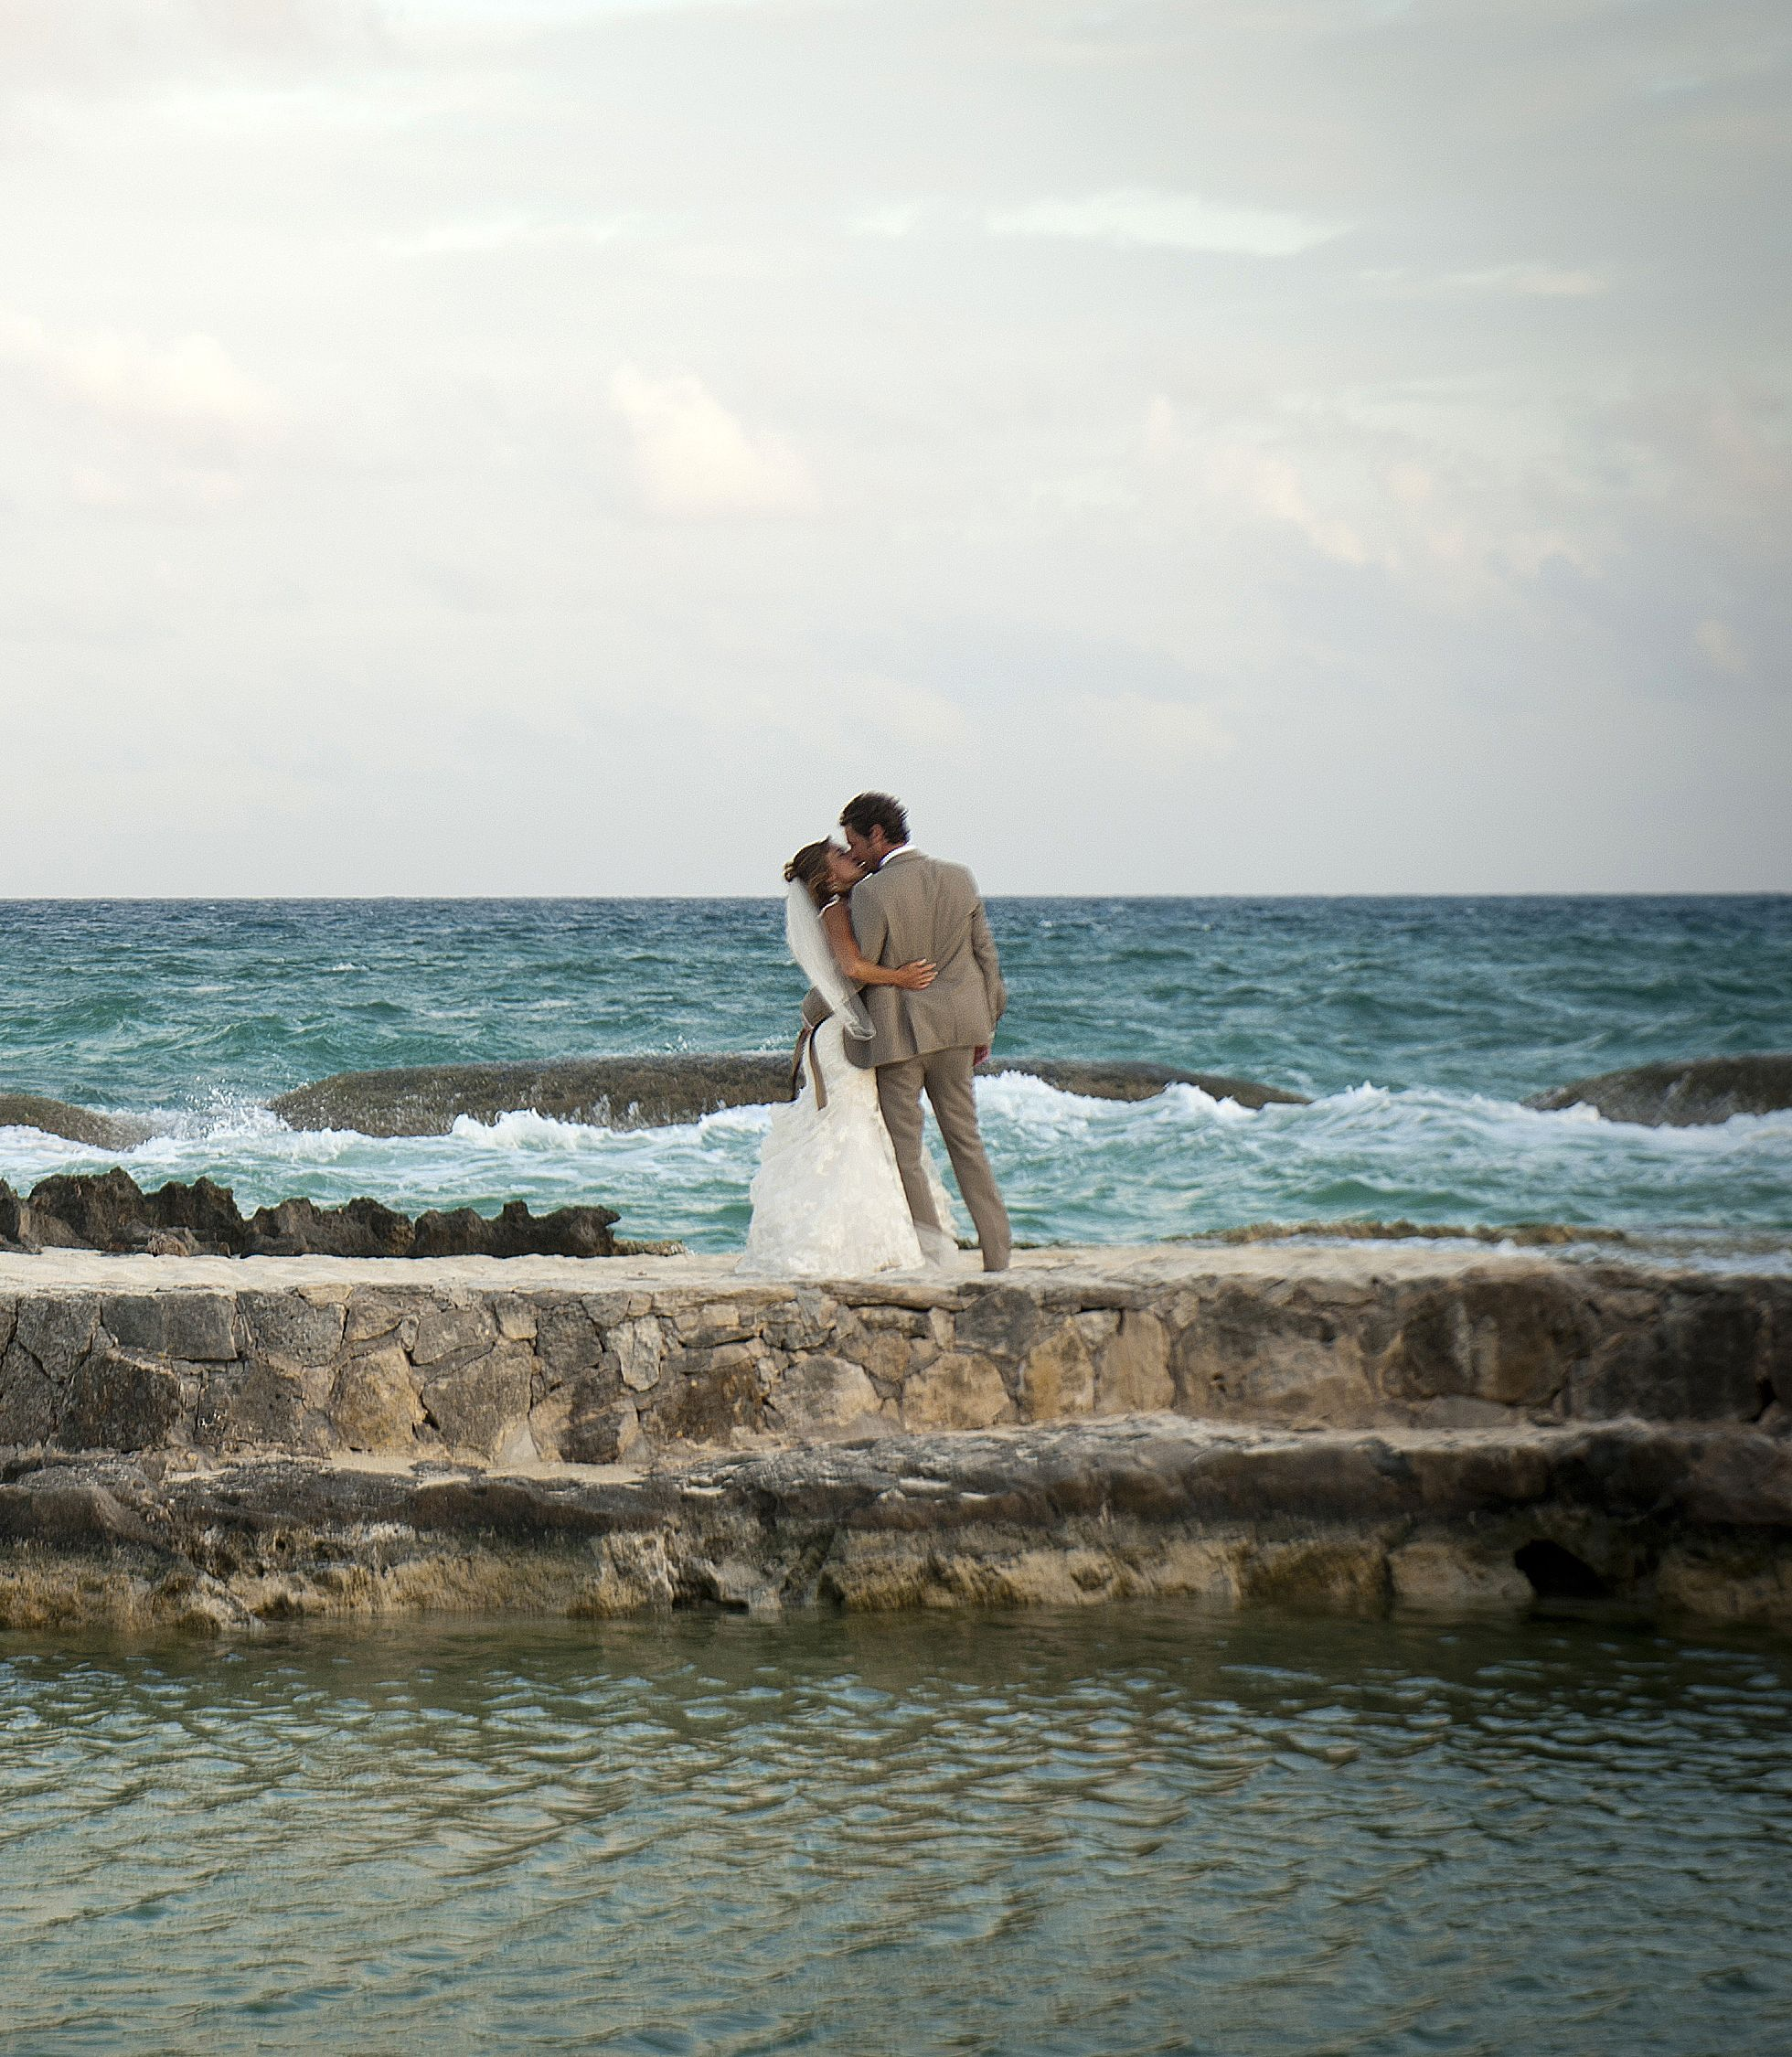 Cheap Wedding Photography Chicago: Such An Amazing Shot! Gotta Love #Chicago #Weddings